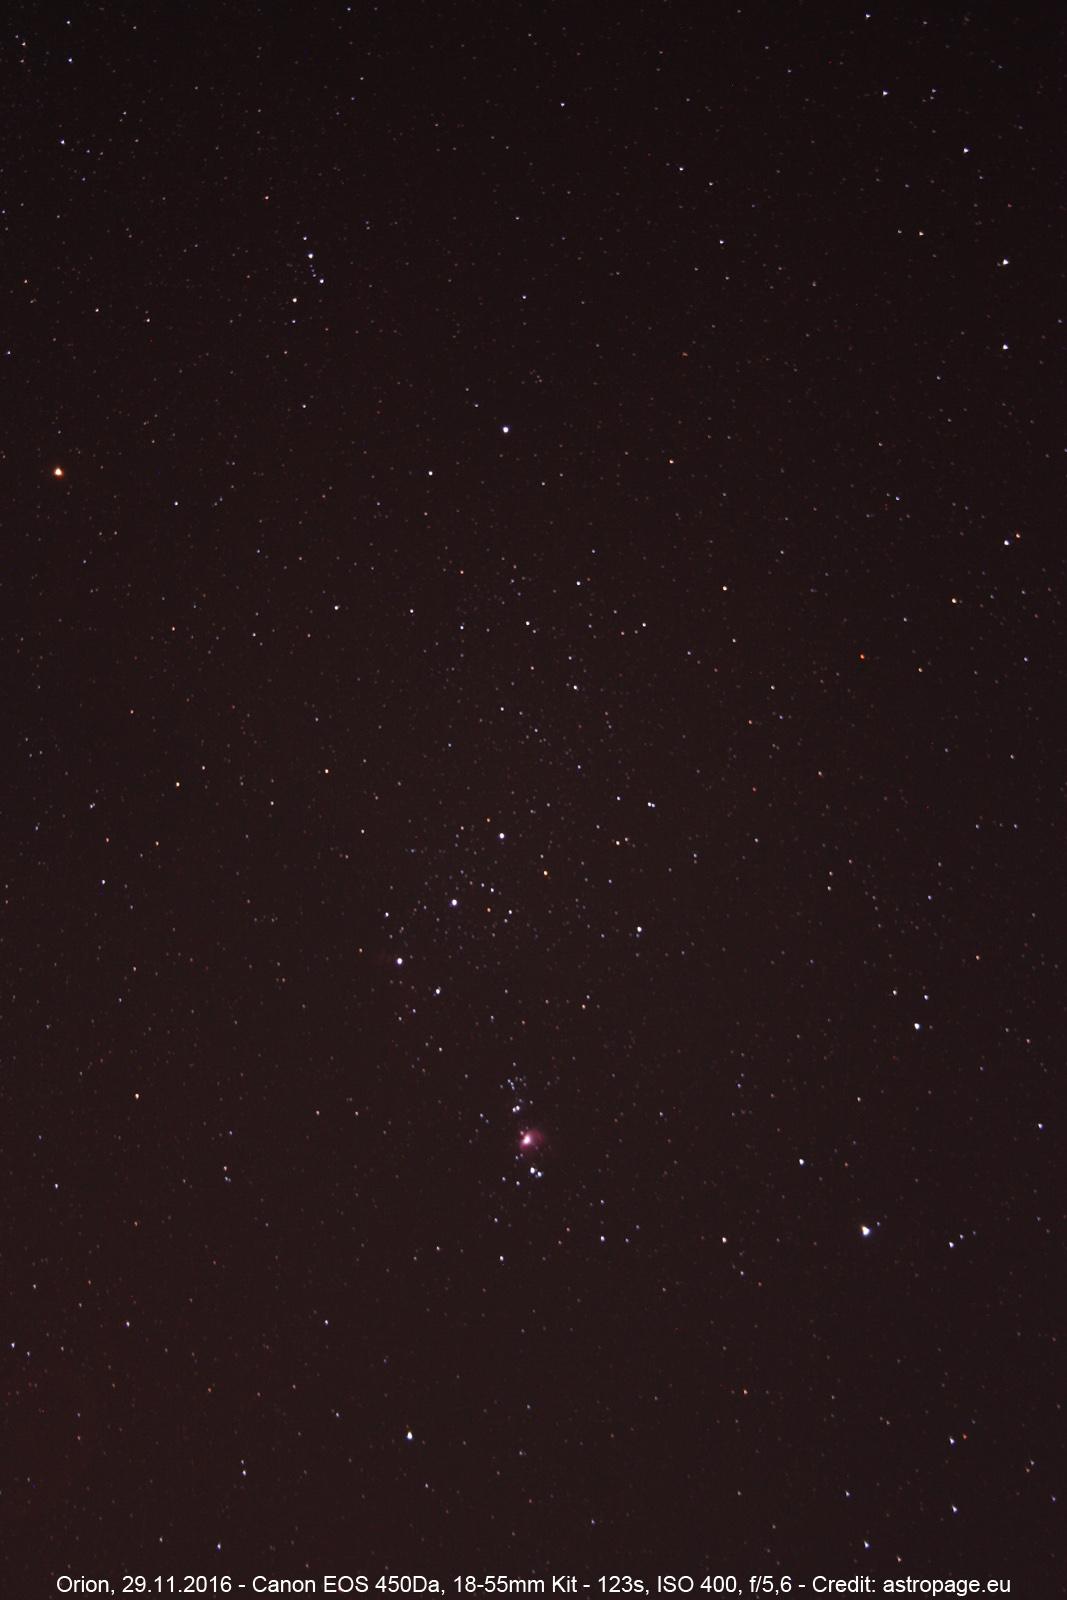 Orion vom 29.11.2016. (astropage.eu)